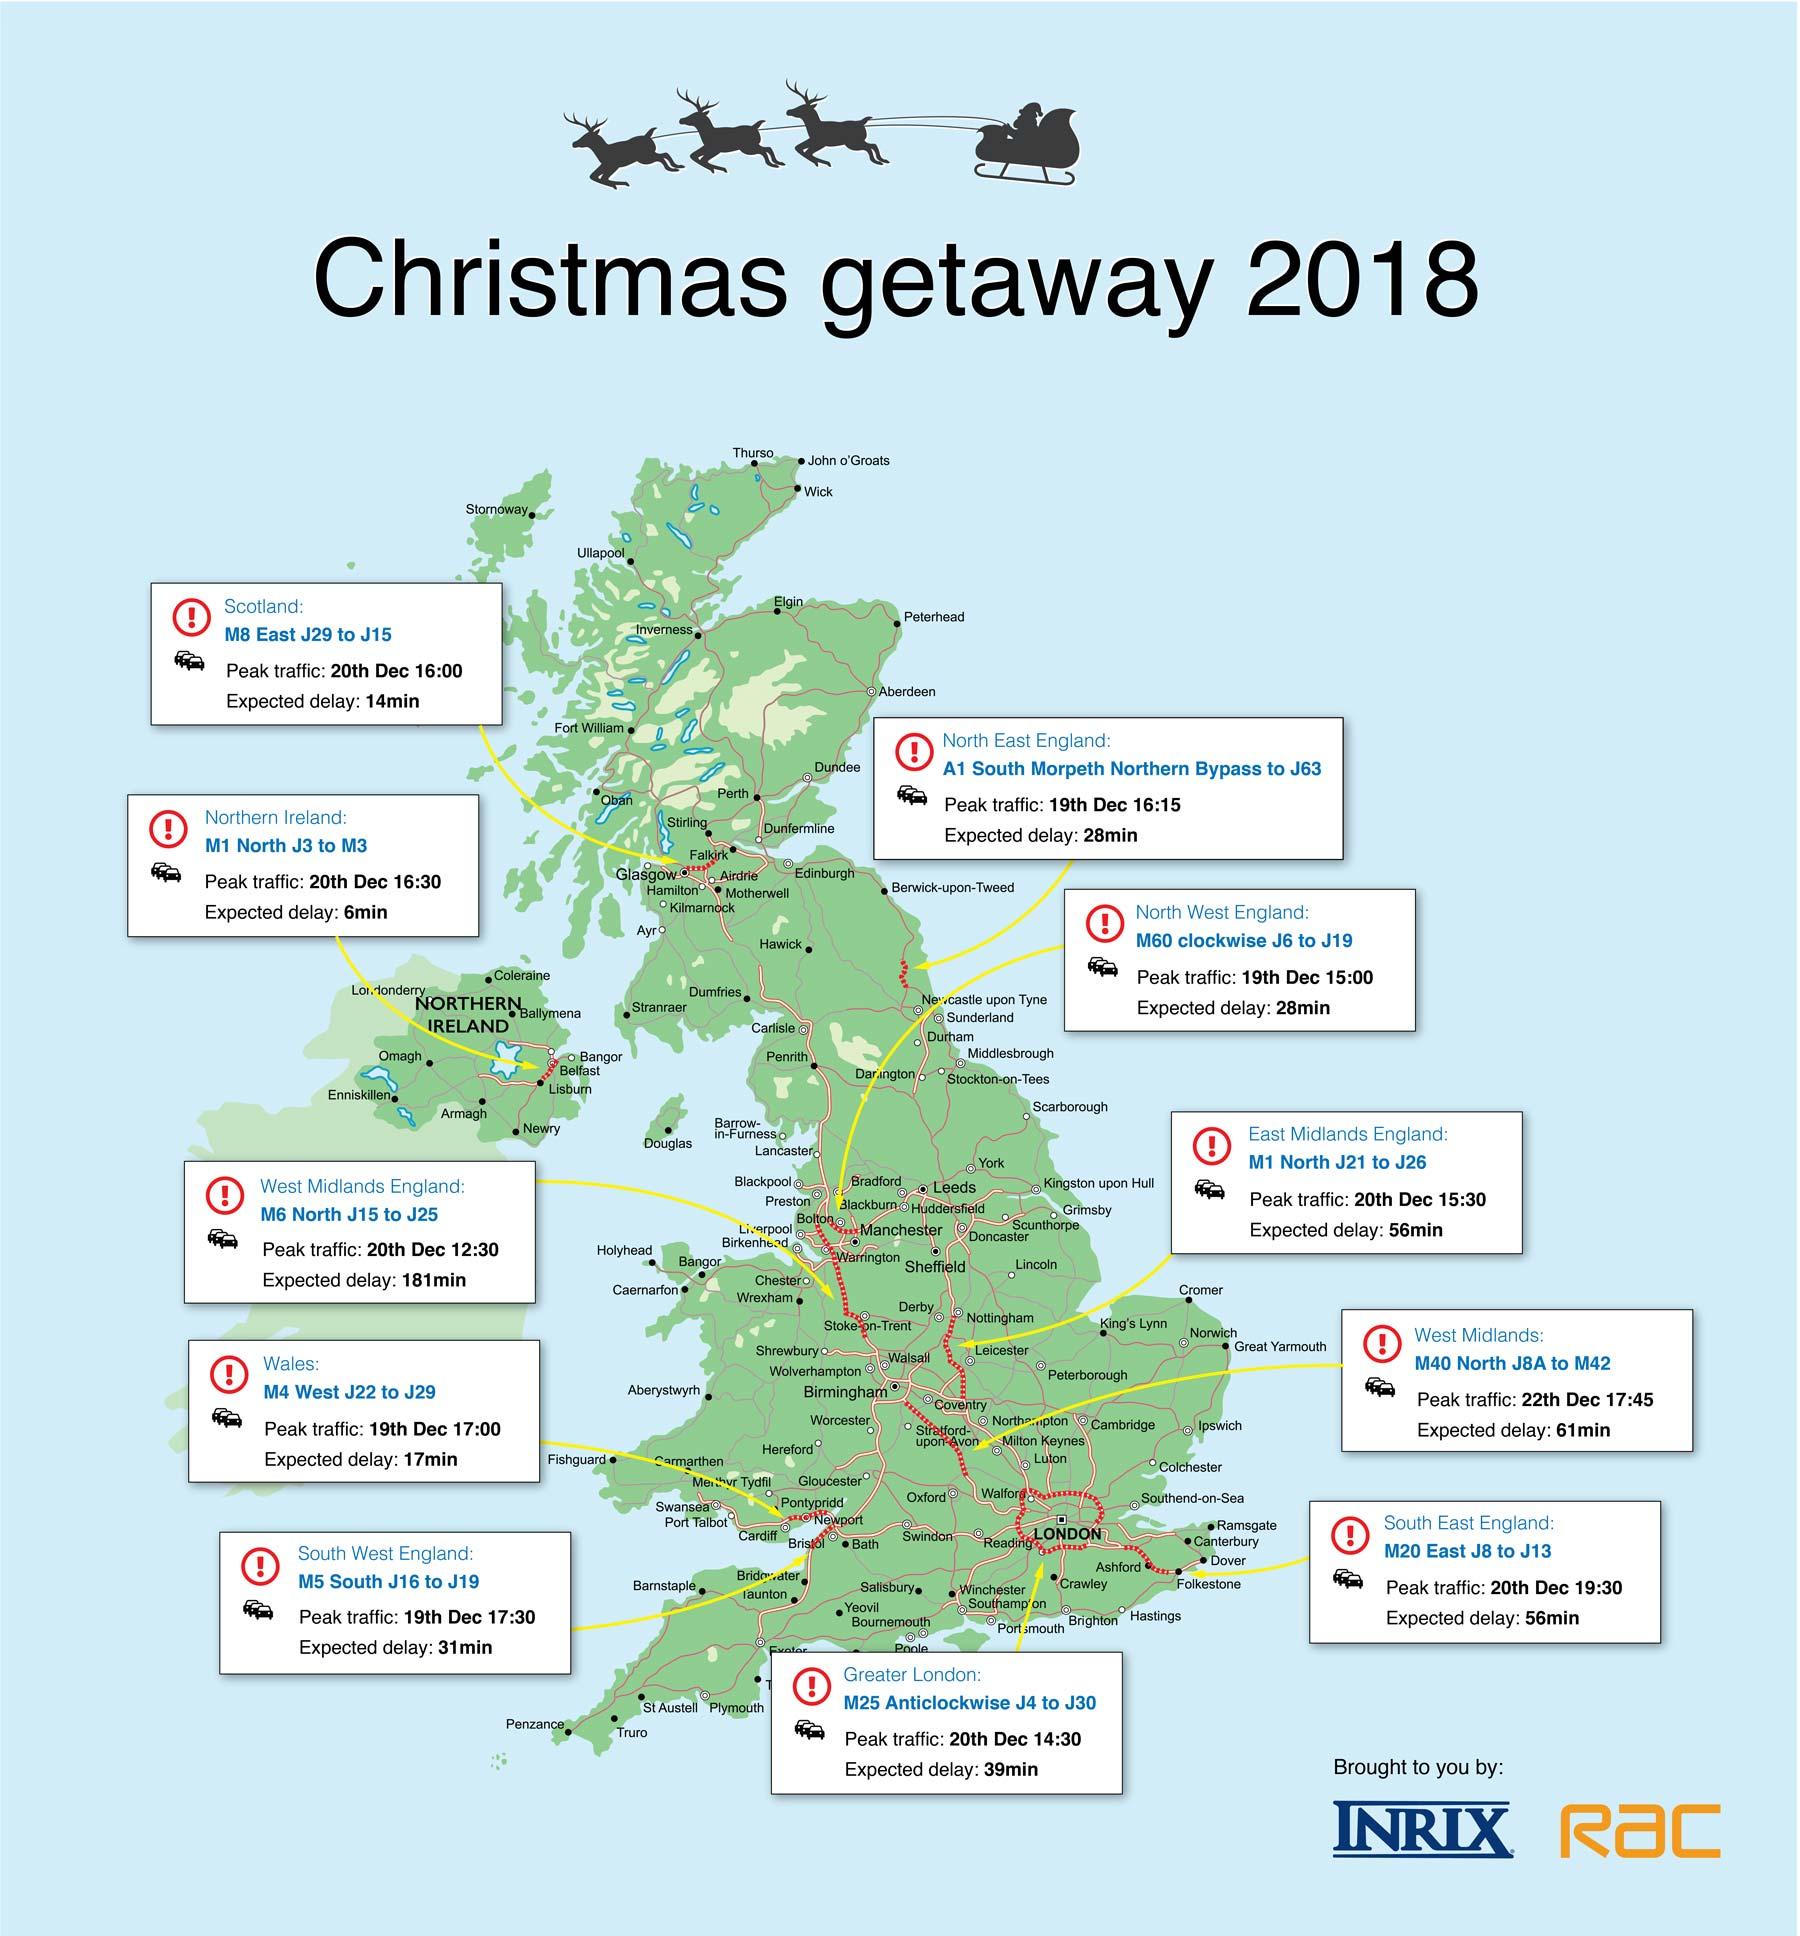 Christmas 2018 - top traffic jam hotspots